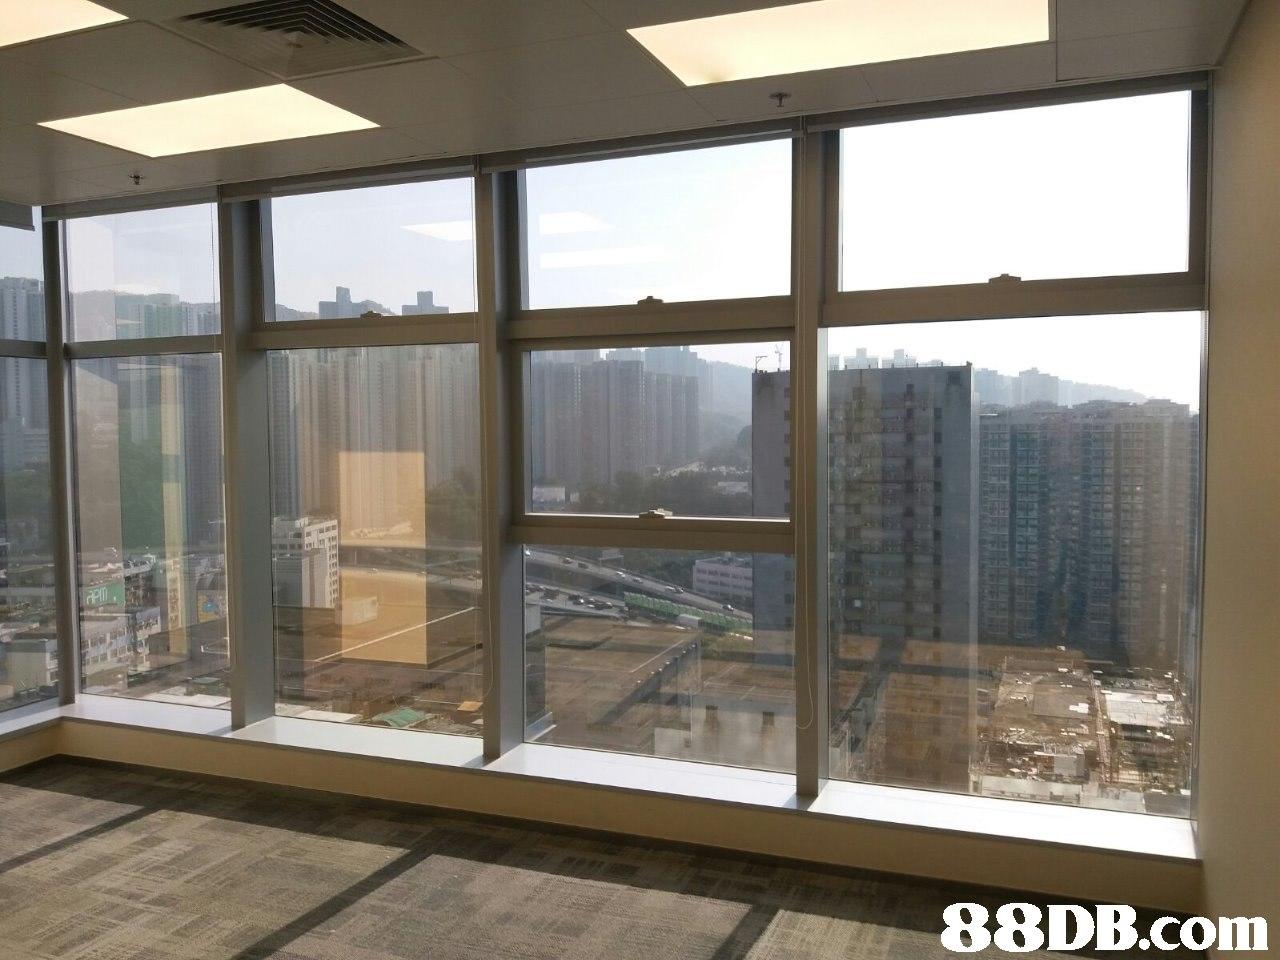 property,window,glass,daylighting,